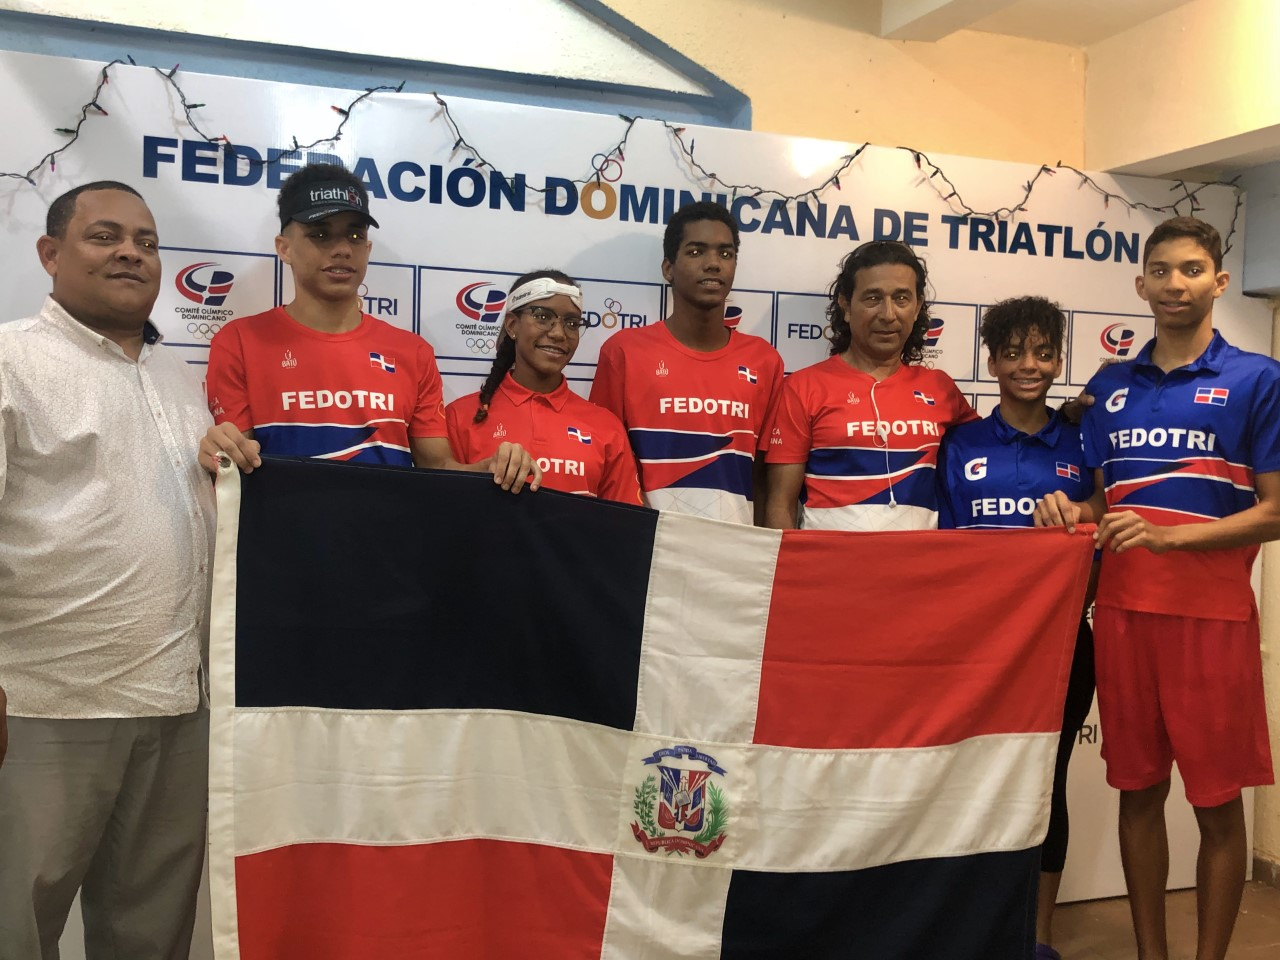 Selección triatlón participará en campeonato élite en Costa Rica